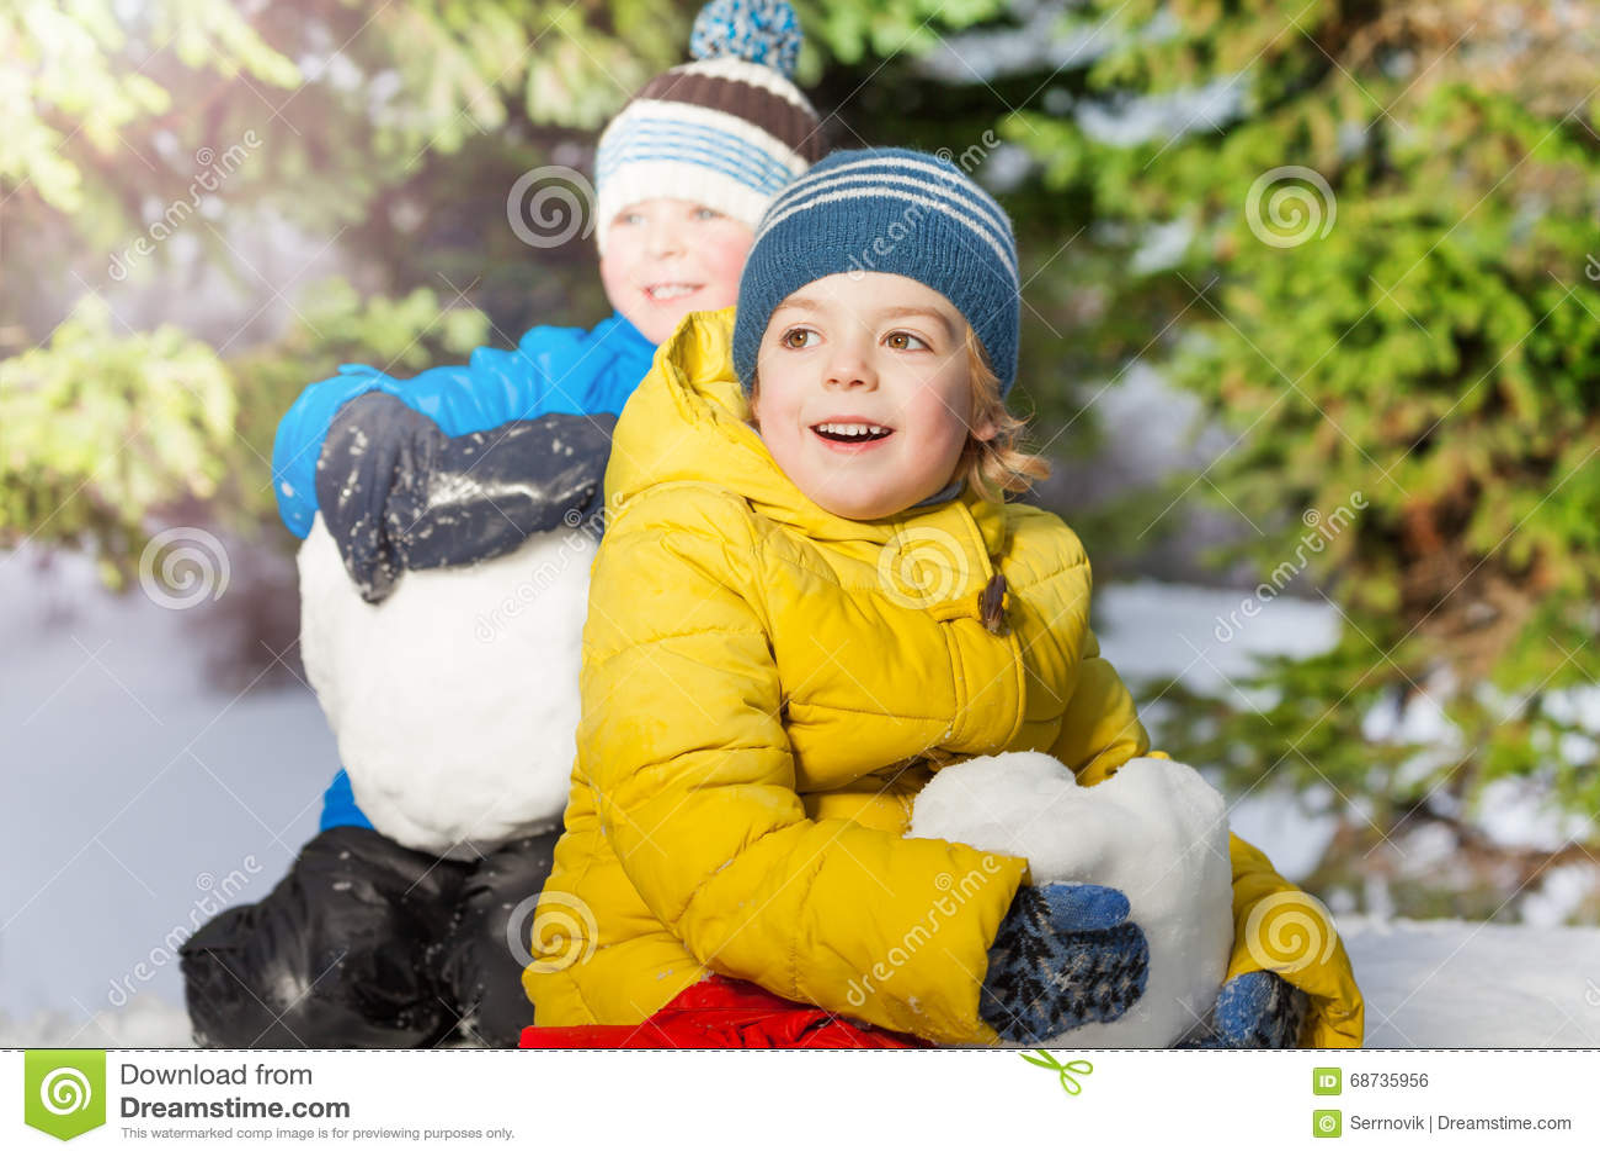 nieve con ninos pequenos